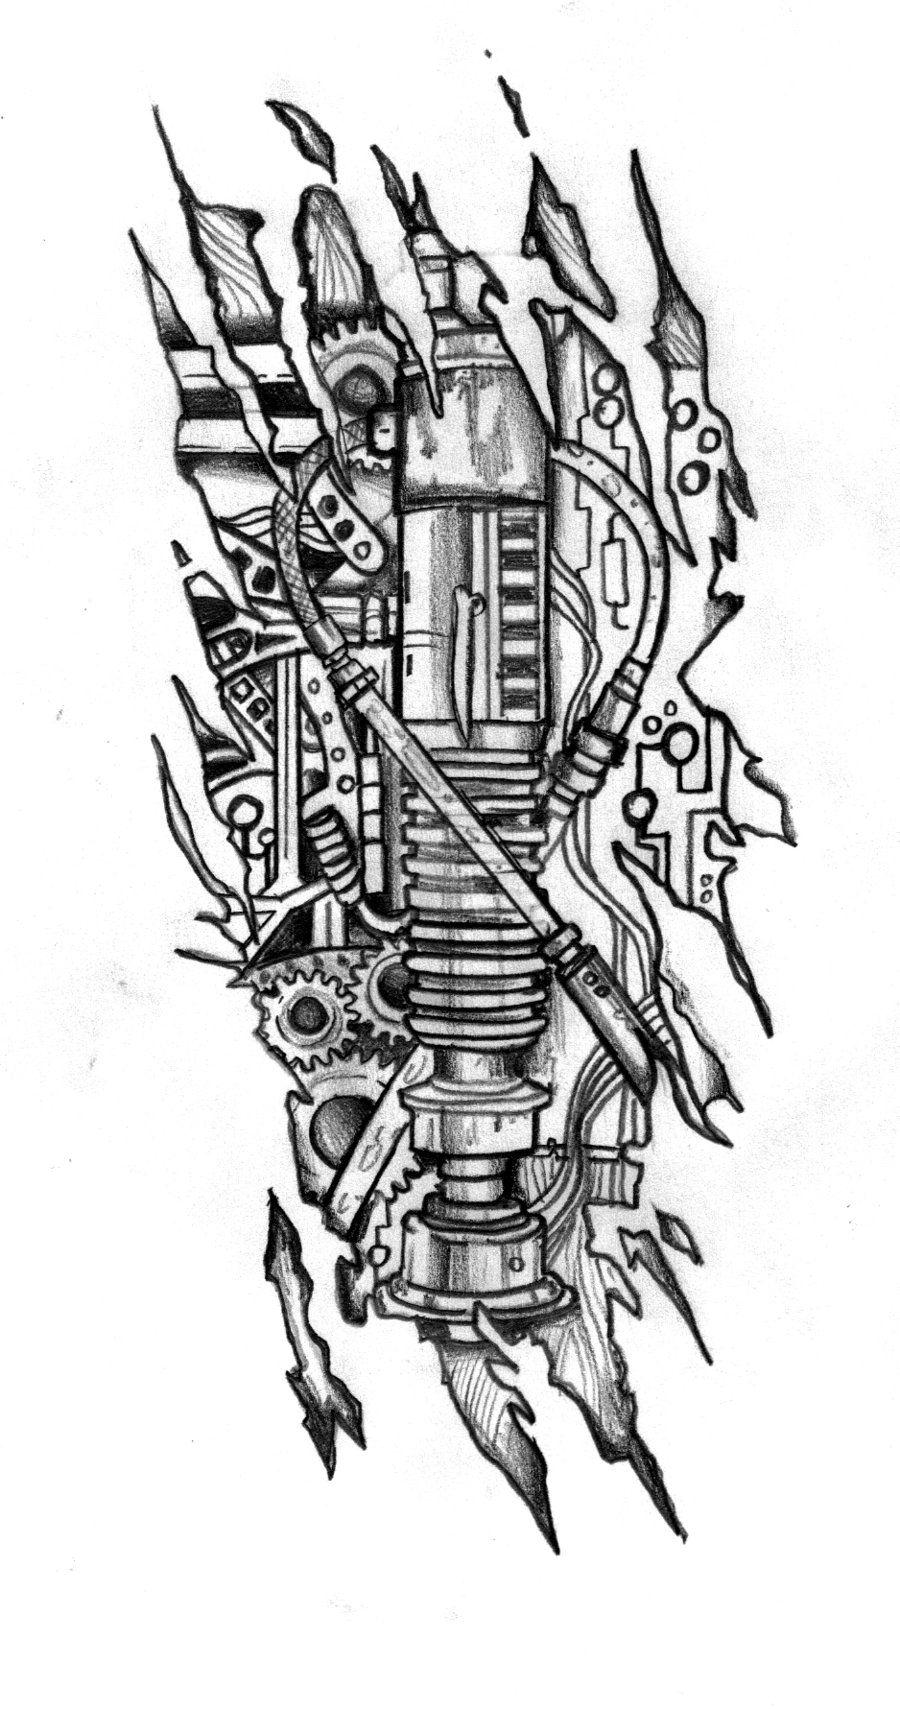 Biomechanic Lightsaber Tattoo Design by CustomArtwerk